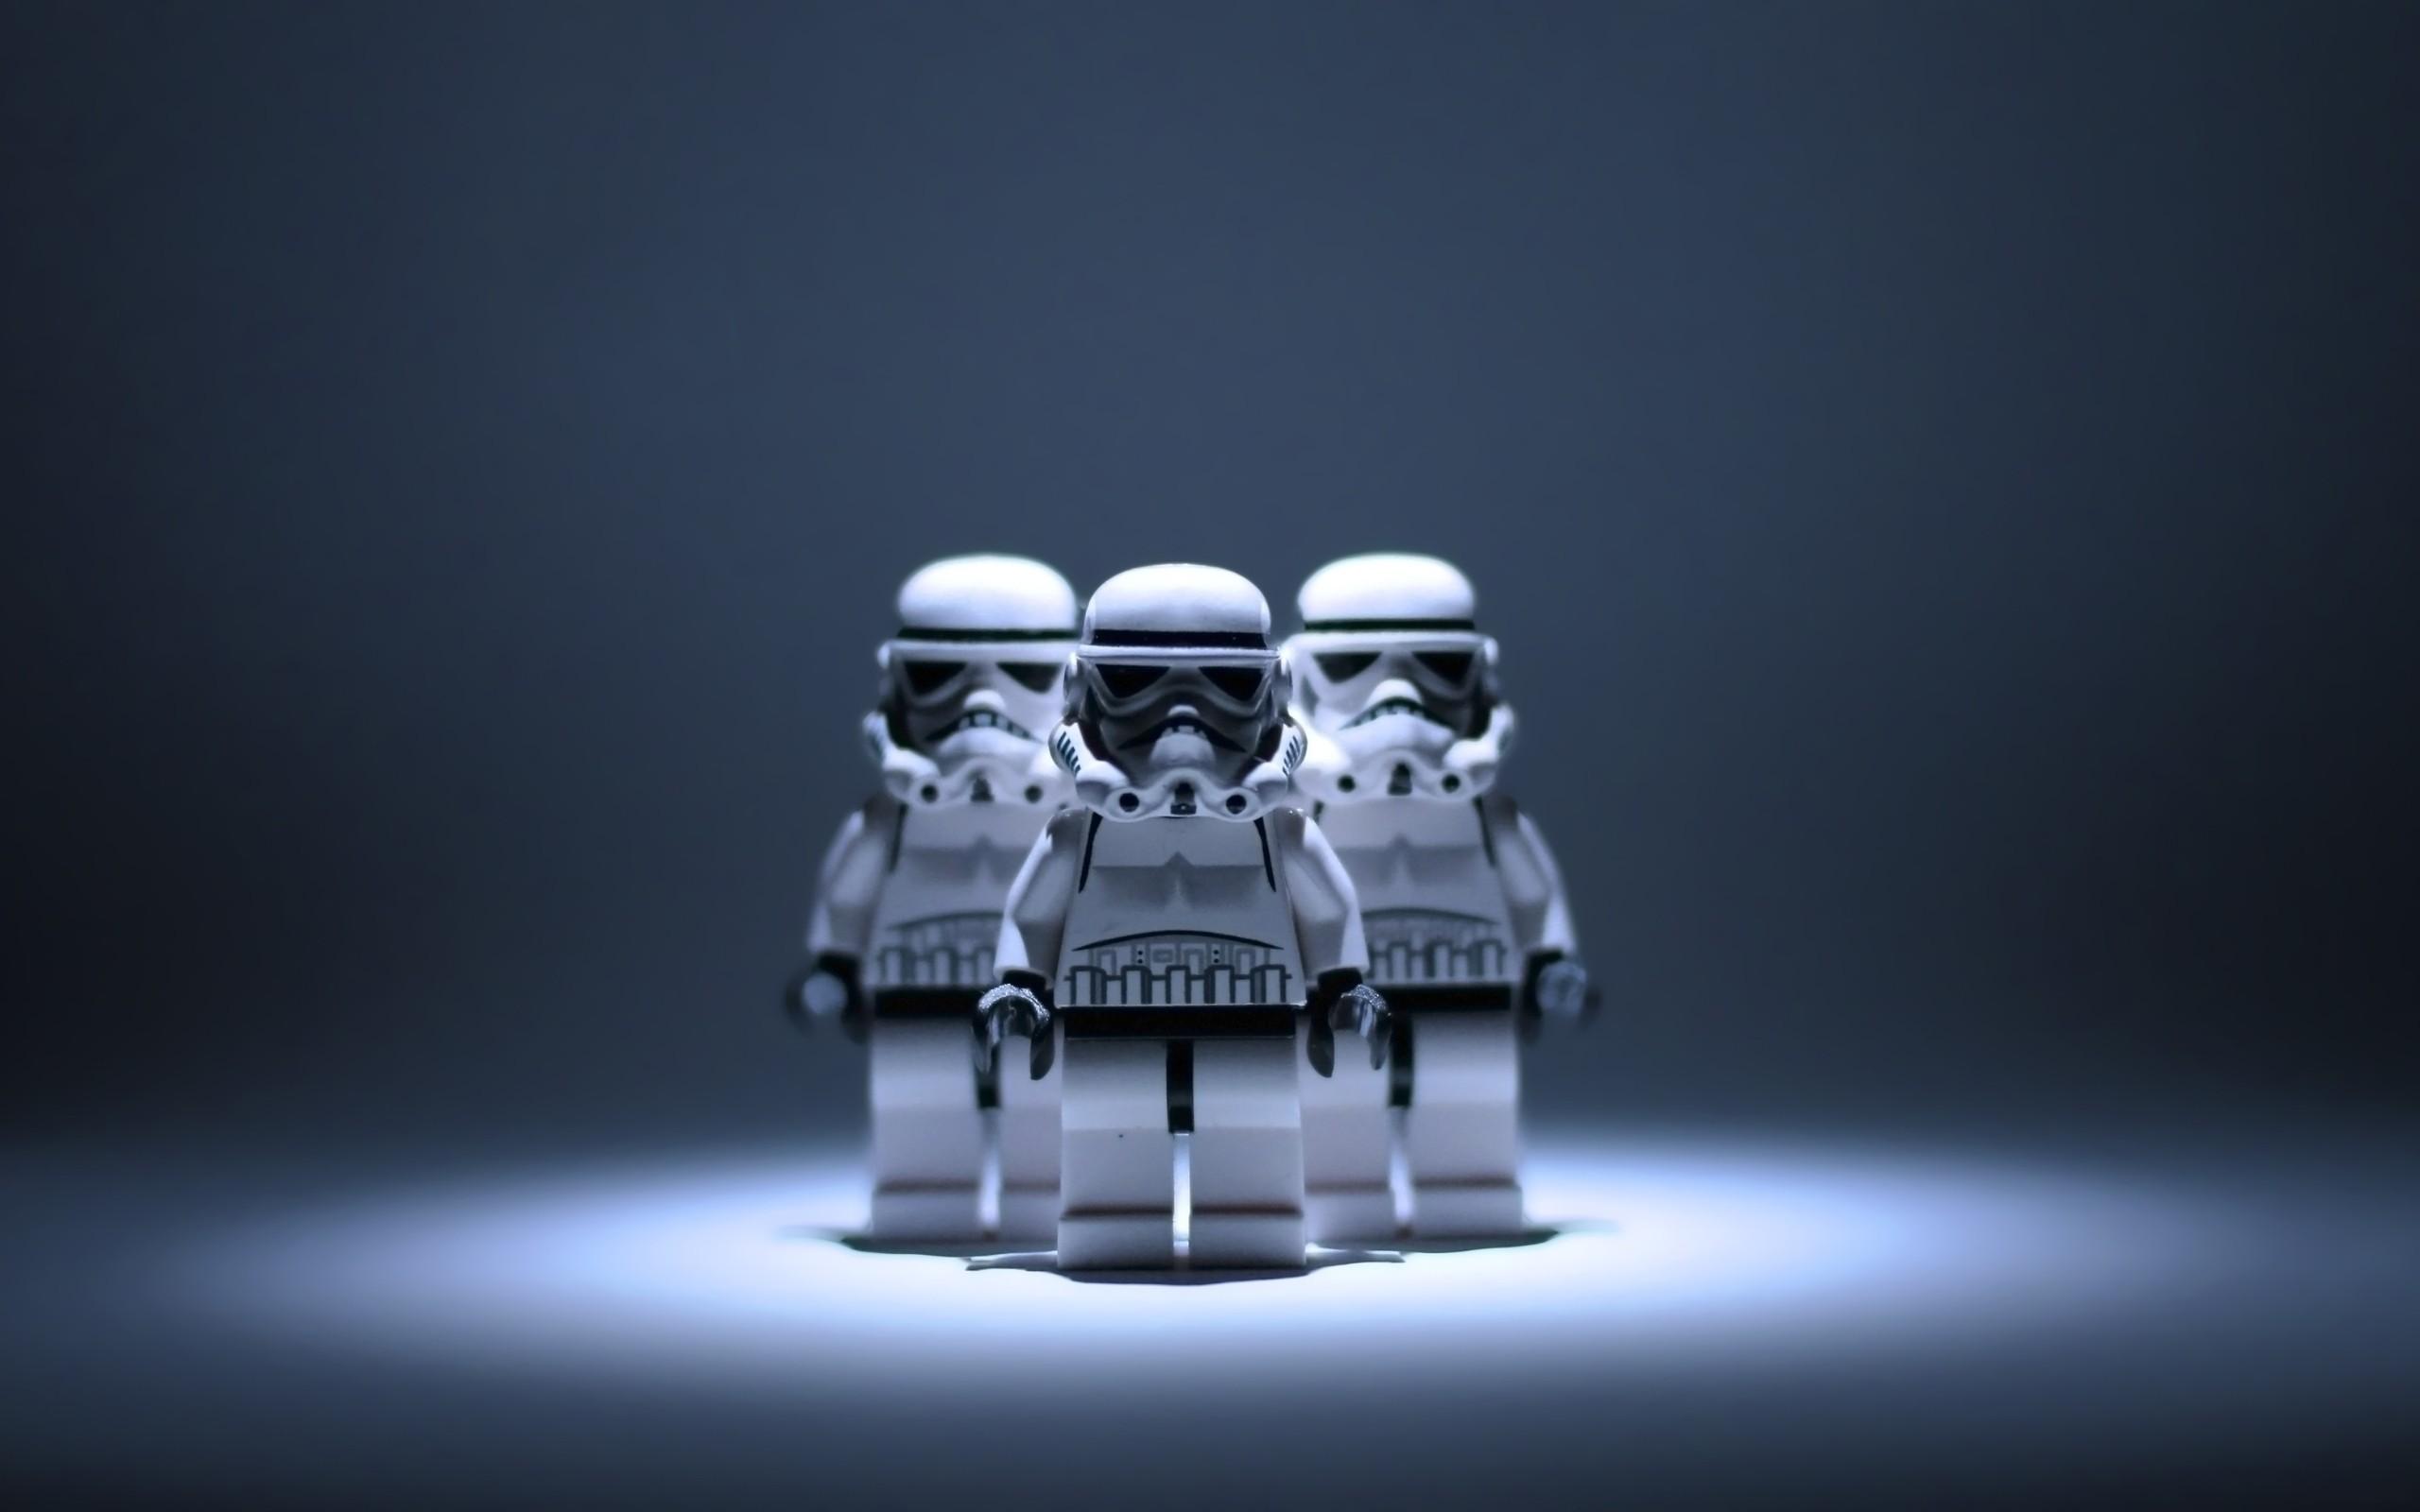 Star Wars Episode 7 Official Poster   wallpaper 2560x1600